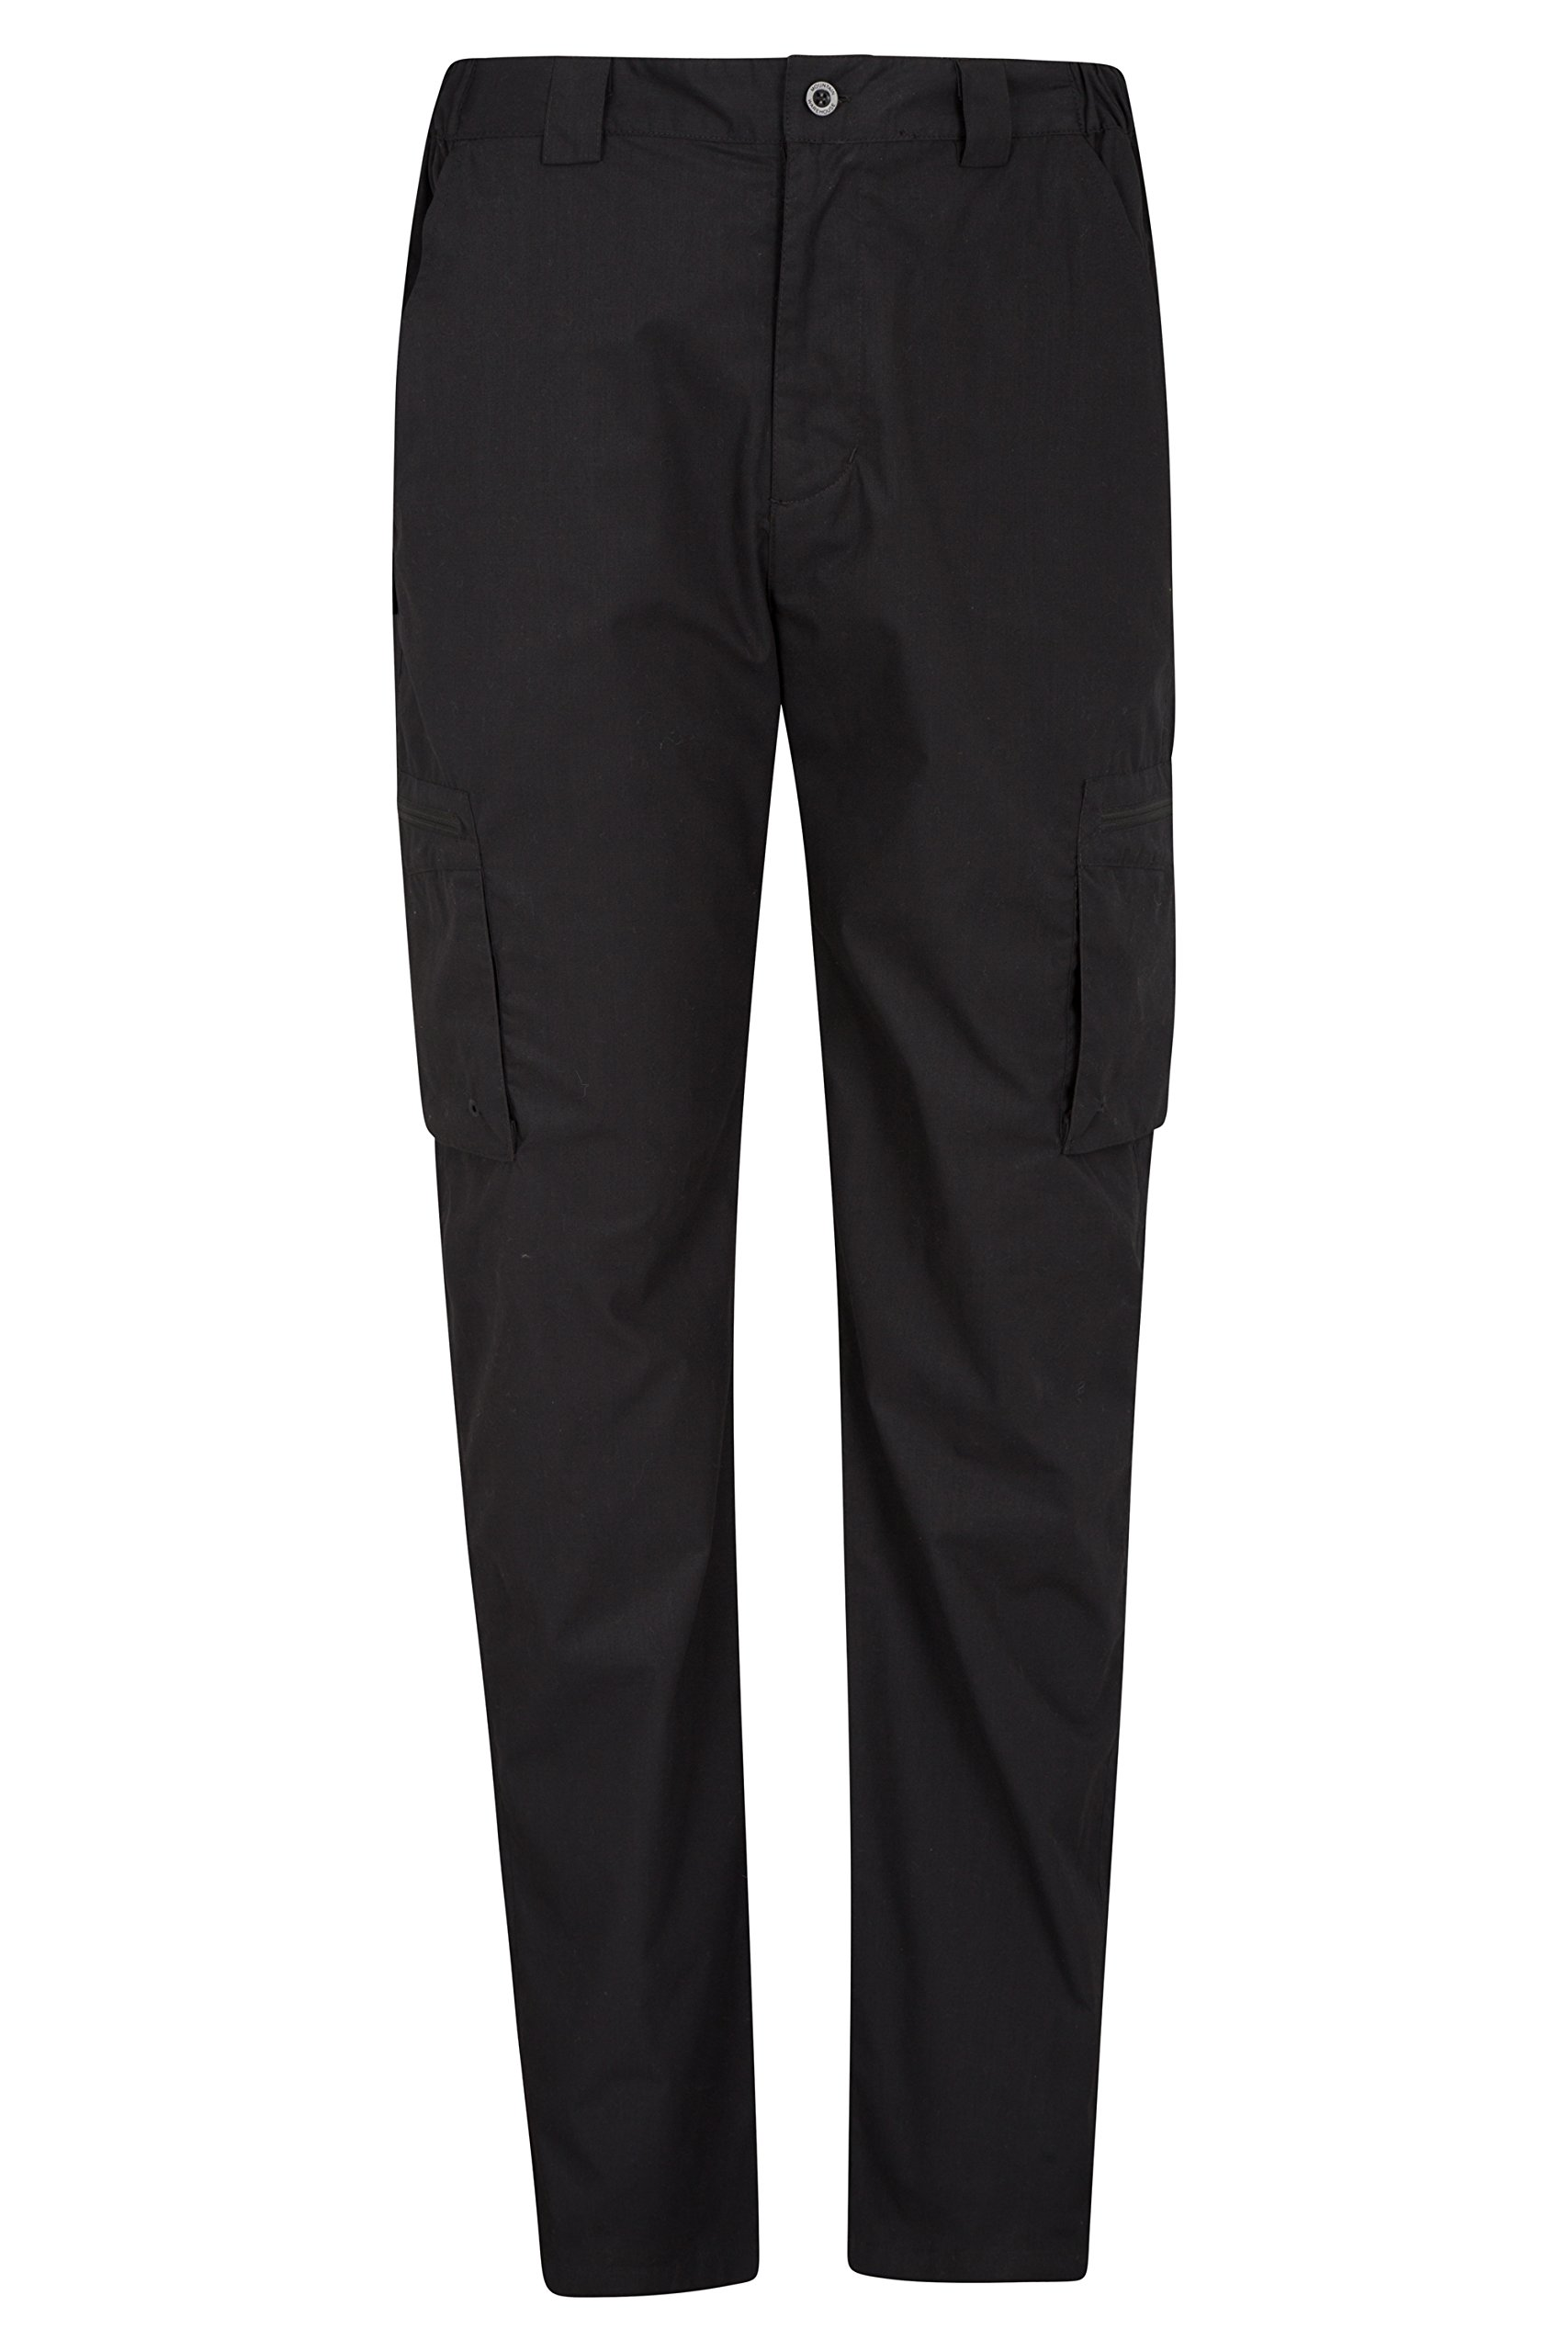 Mountain Warehouse Trek Mens Outdoor Trousers - Summer Hiking Pants Black 36